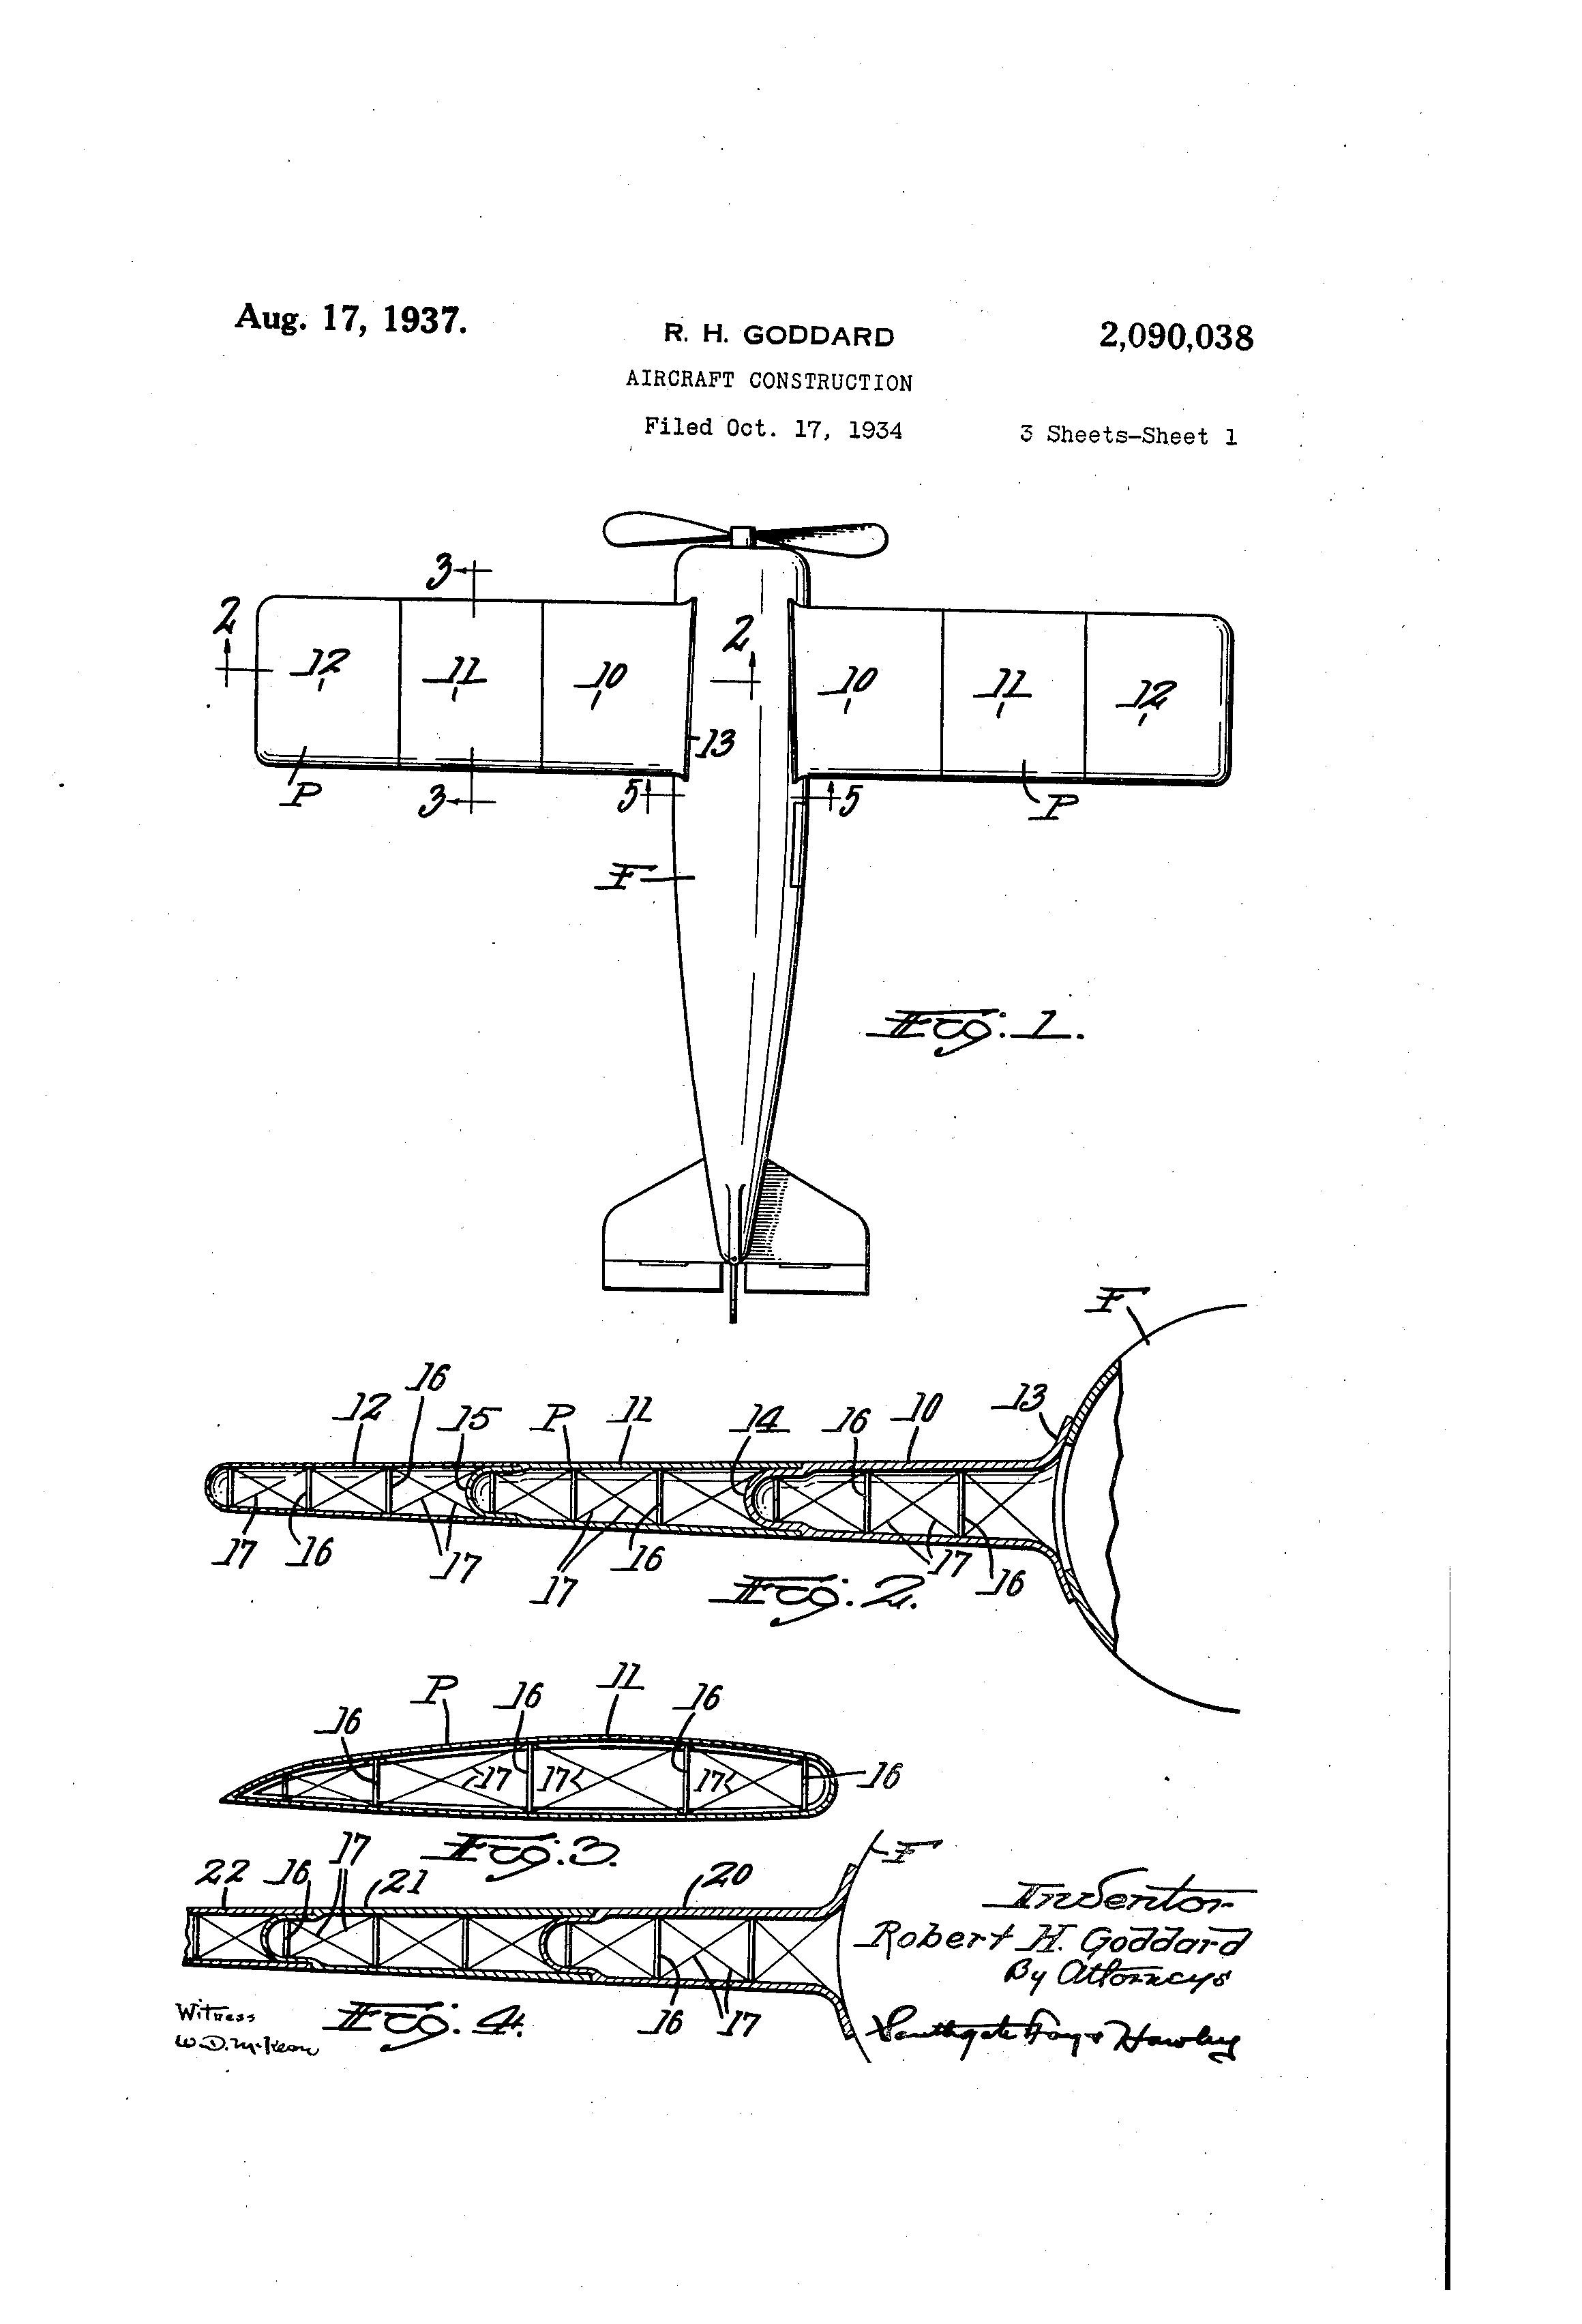 Airplane Engine Diagram Us A Aircraft Construction Google Patents Of Airplane Engine Diagram